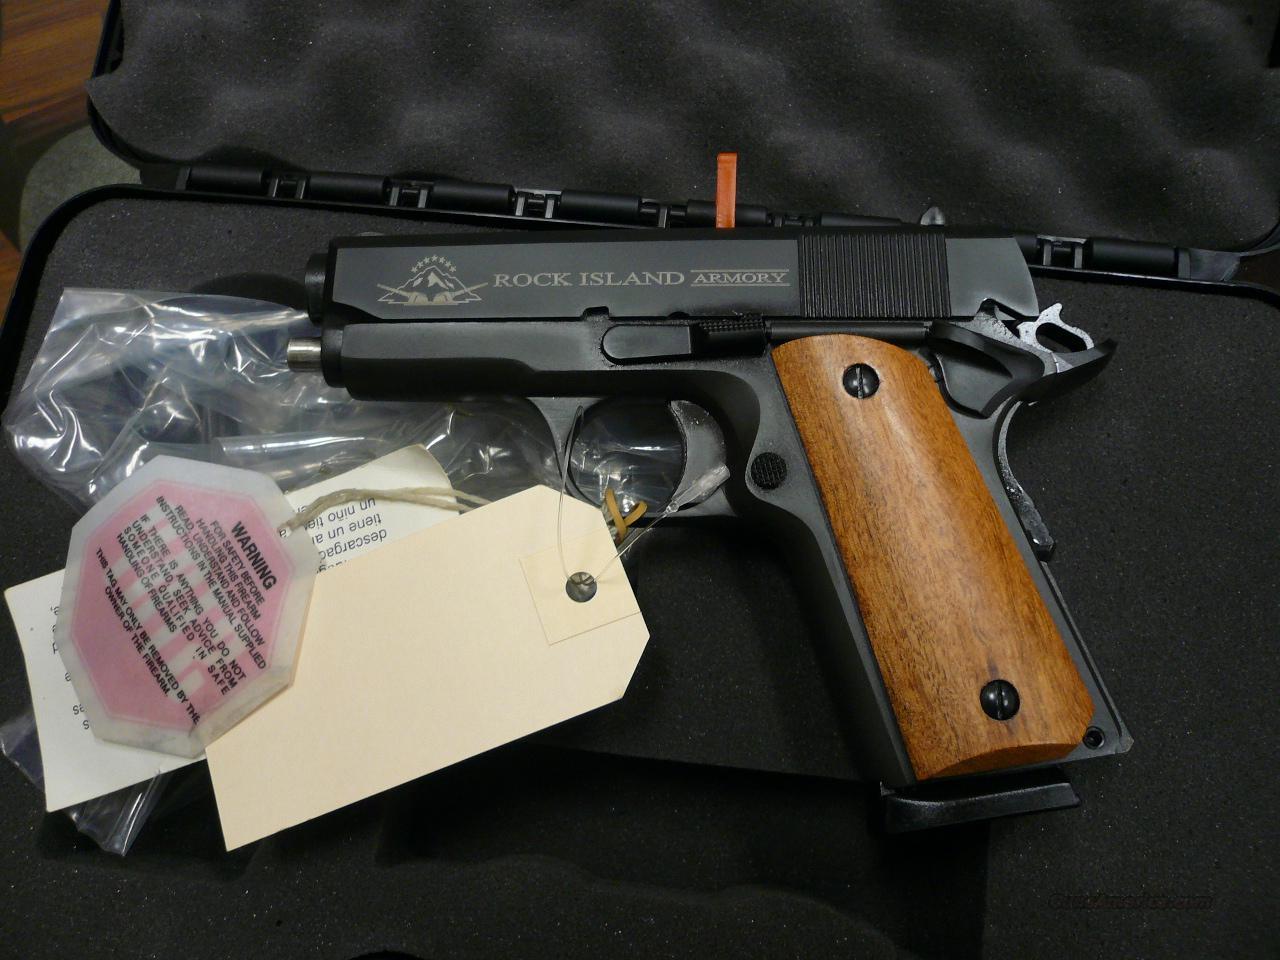 RIA Model-M1911A1 Compact 45 Acp  Guns > Pistols > Rock Island Armory Pistols